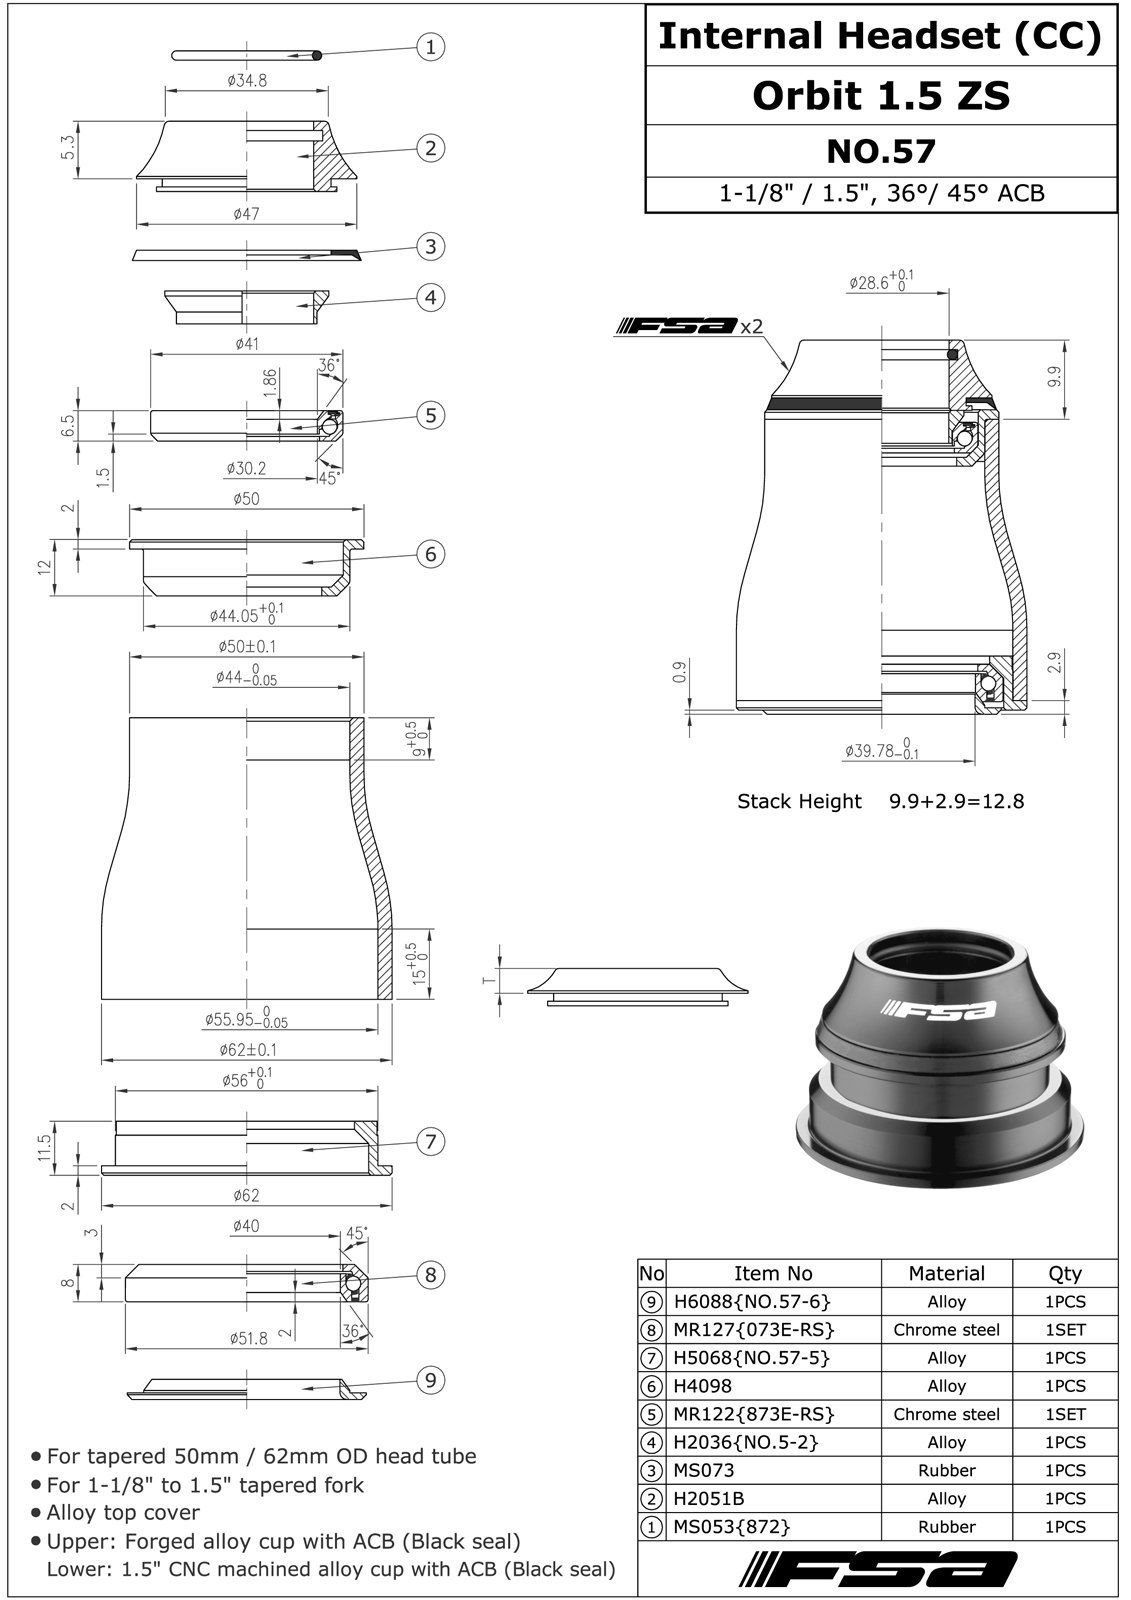 FSA No.57 Orbit 1.5 ZS 1-1/8''-1.5'' Sealed Bearing Tapered Headset #XTE1530